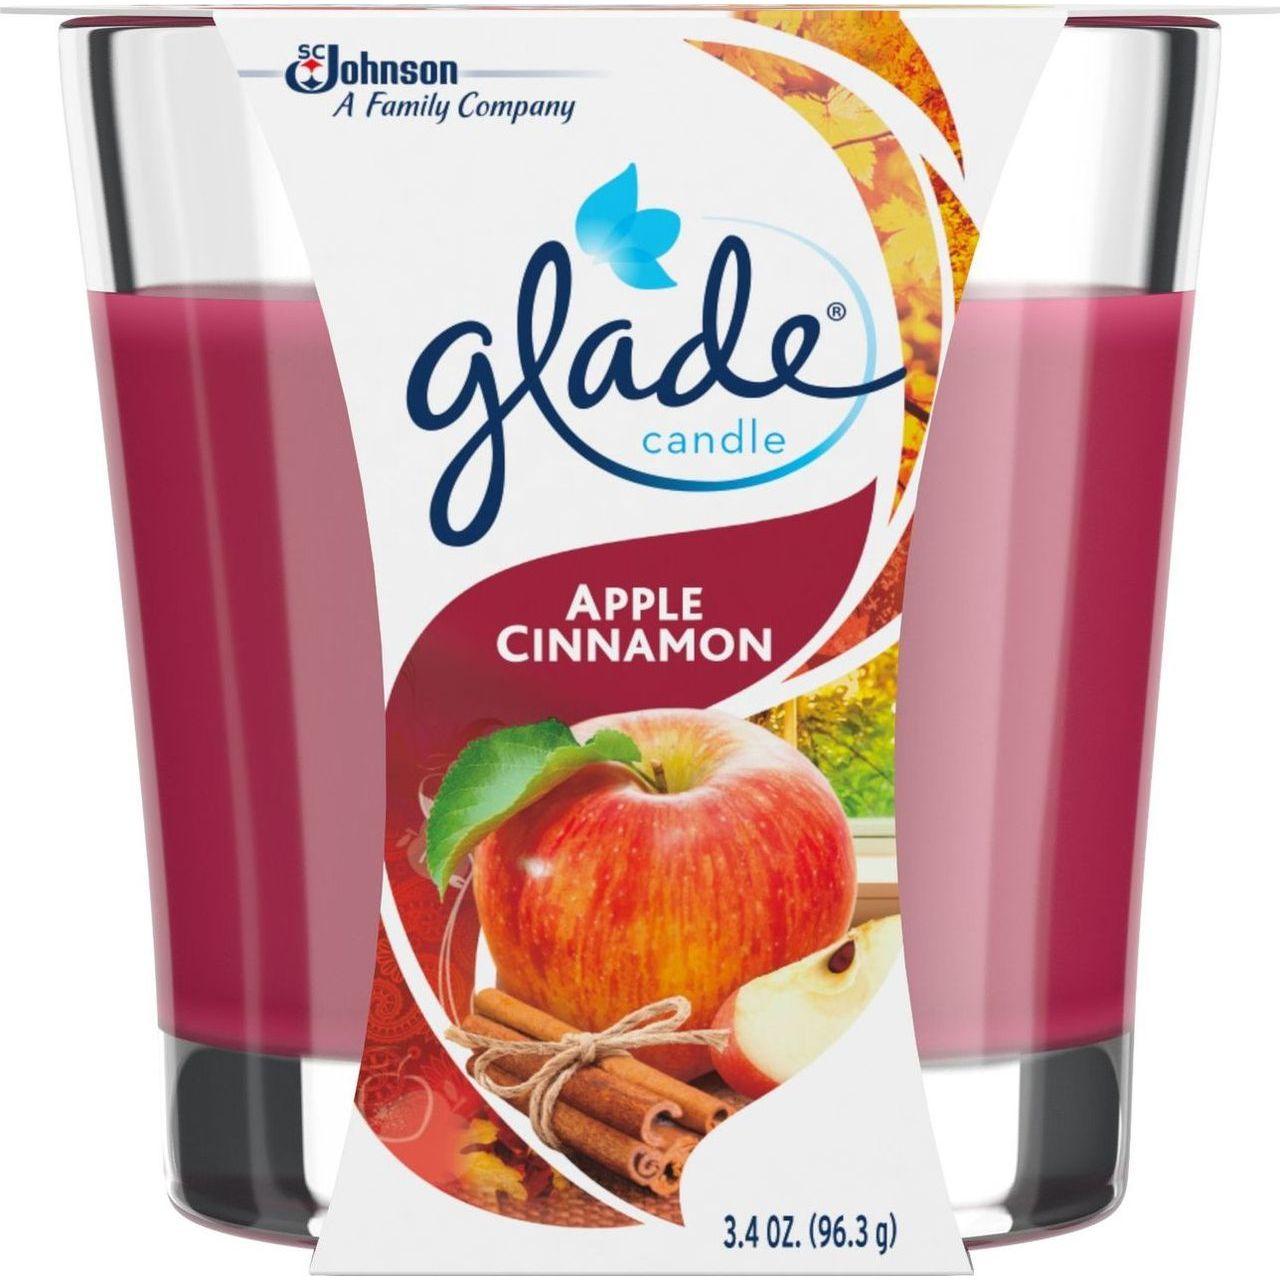 SC Johnson 3.4 oz Jar Apple Cinnamon Candle Air Freshener